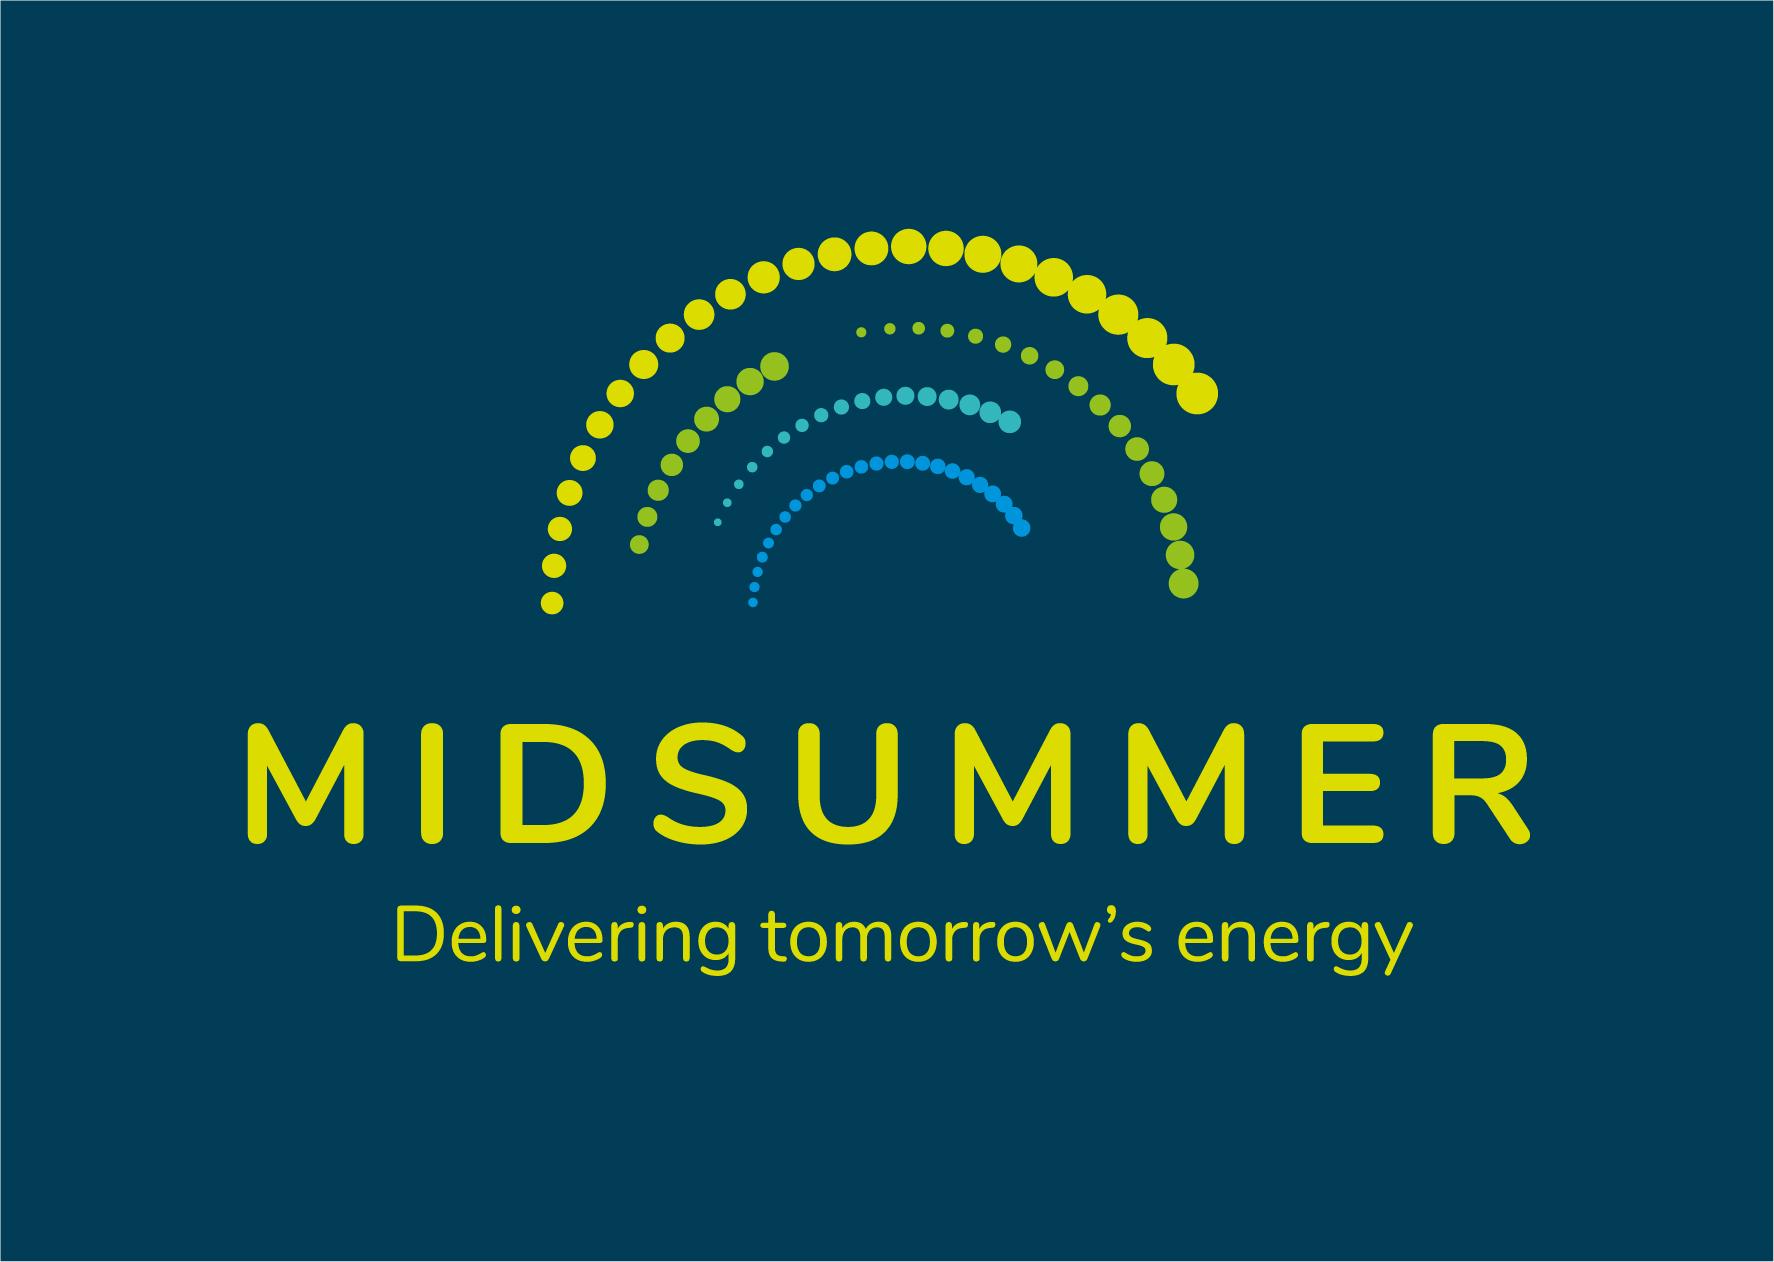 Midsummer has rebranded to mark its 15th anniversary. (Photo: Midsummer)